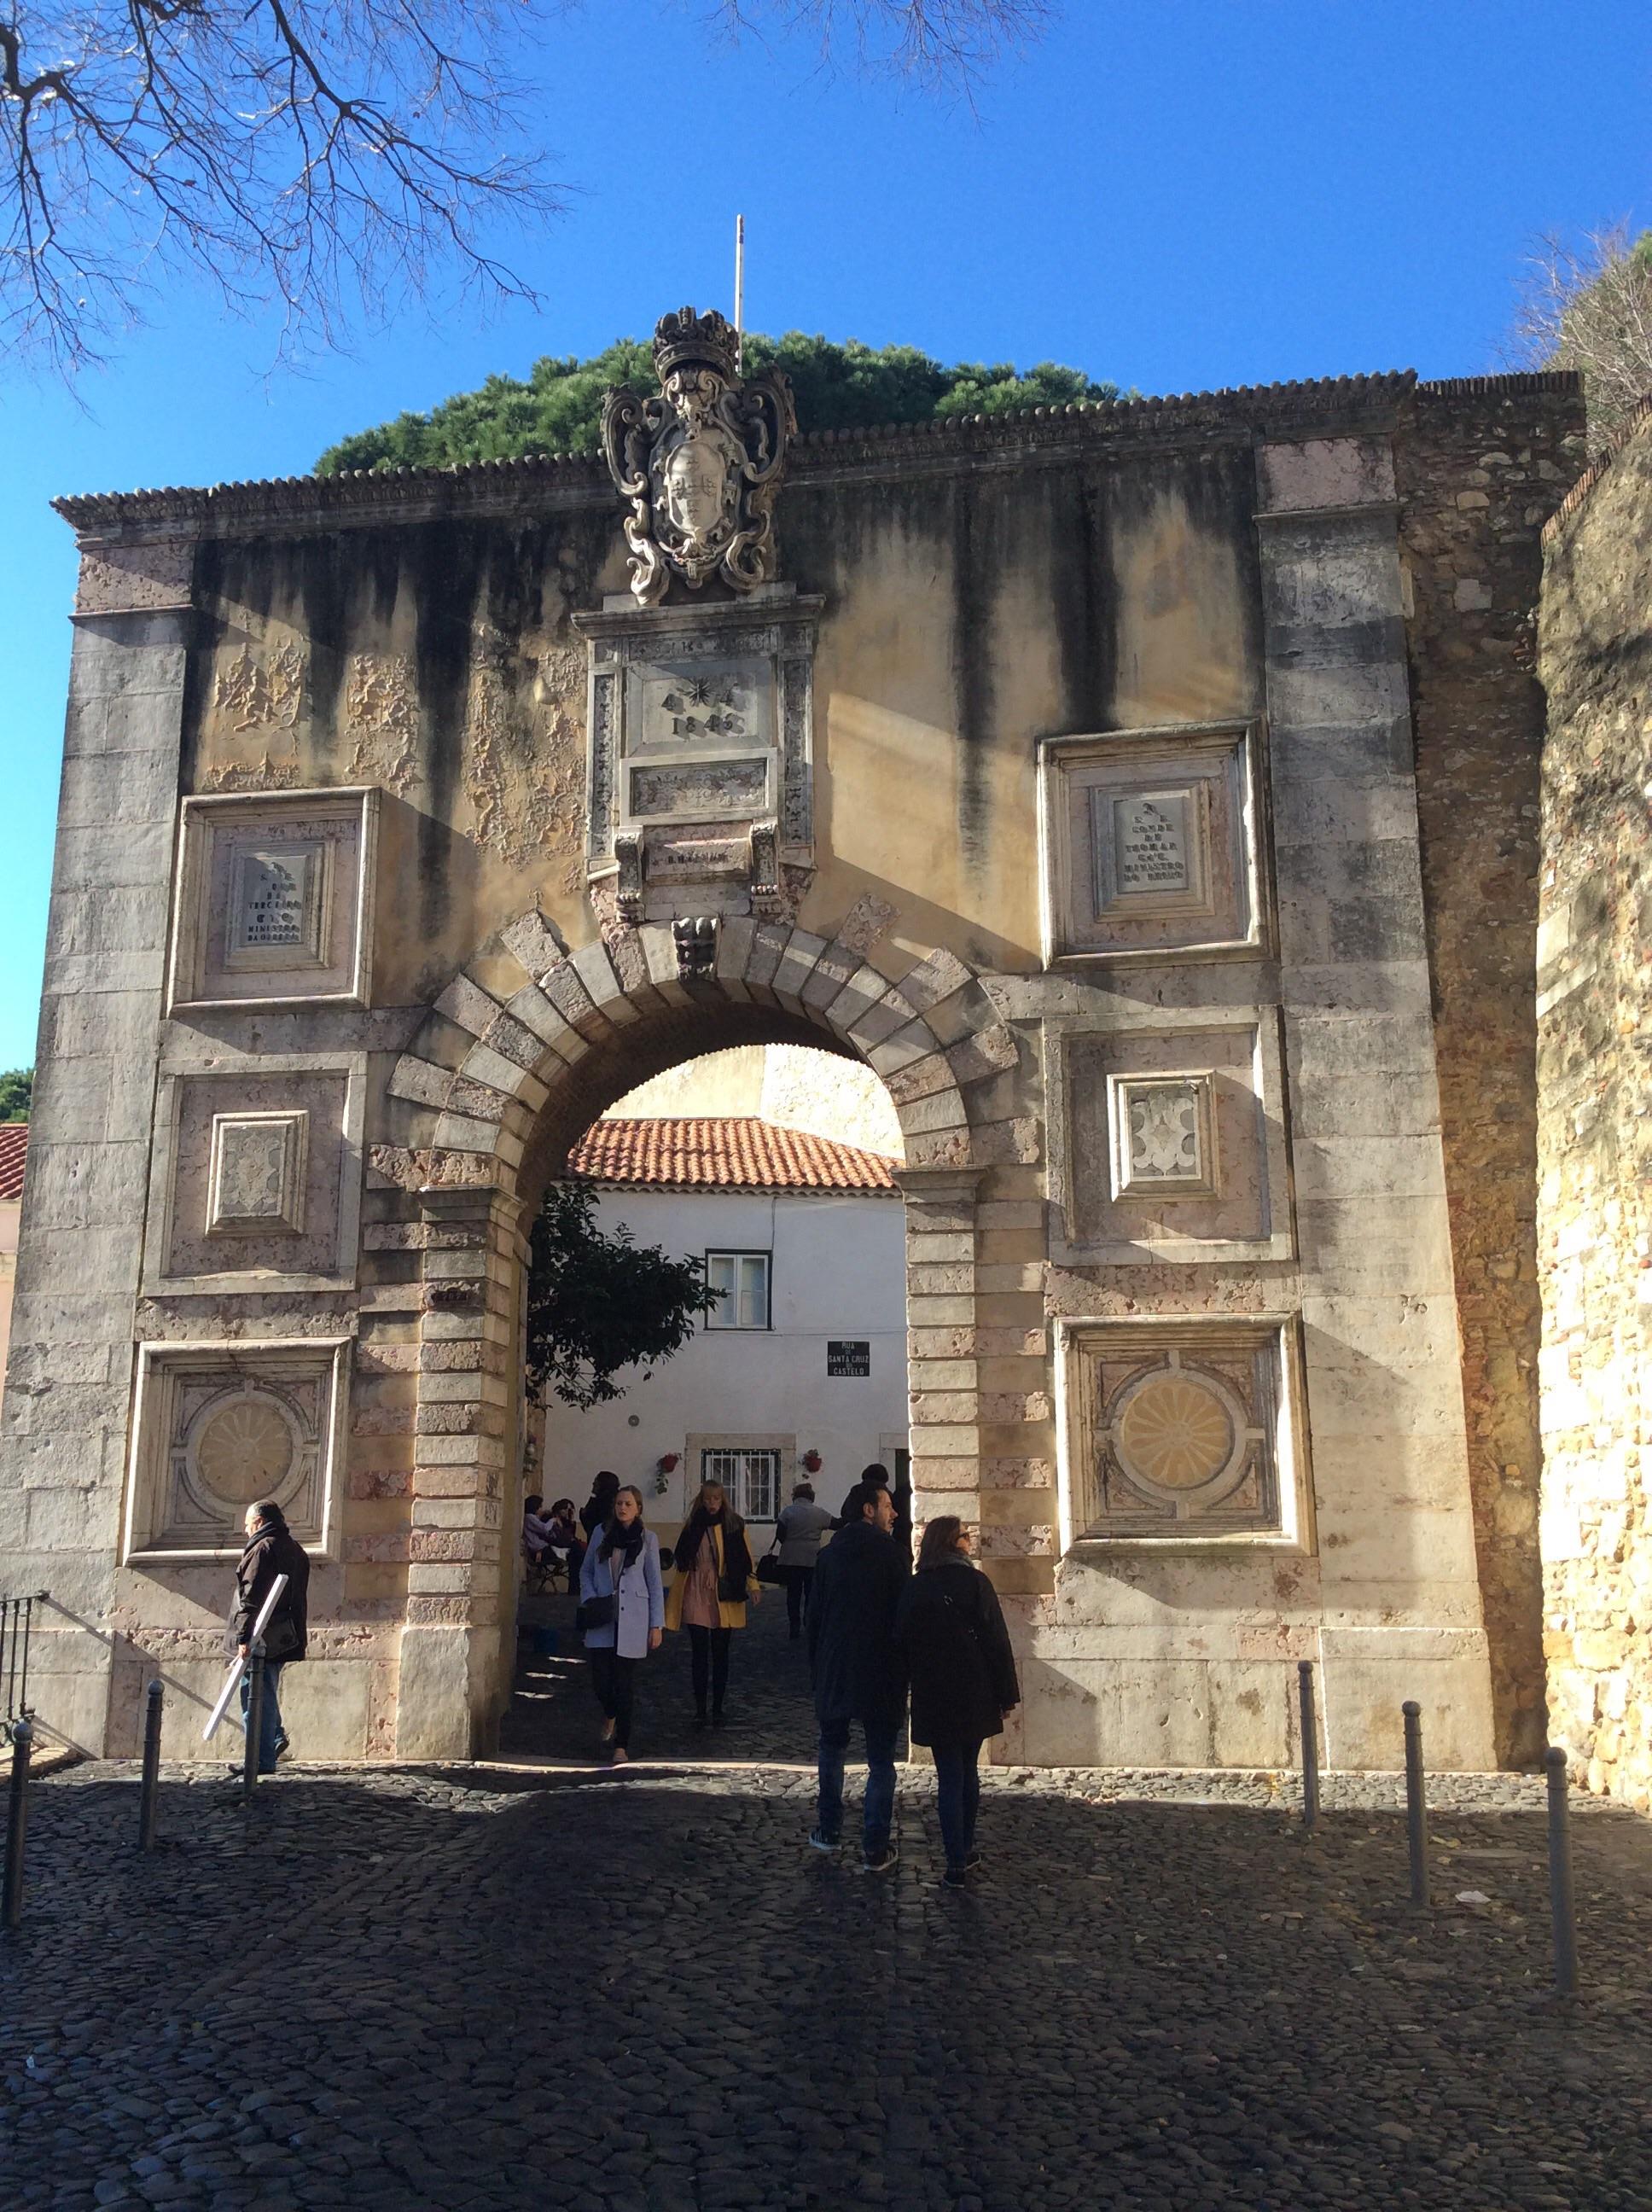 Entrance area to castle